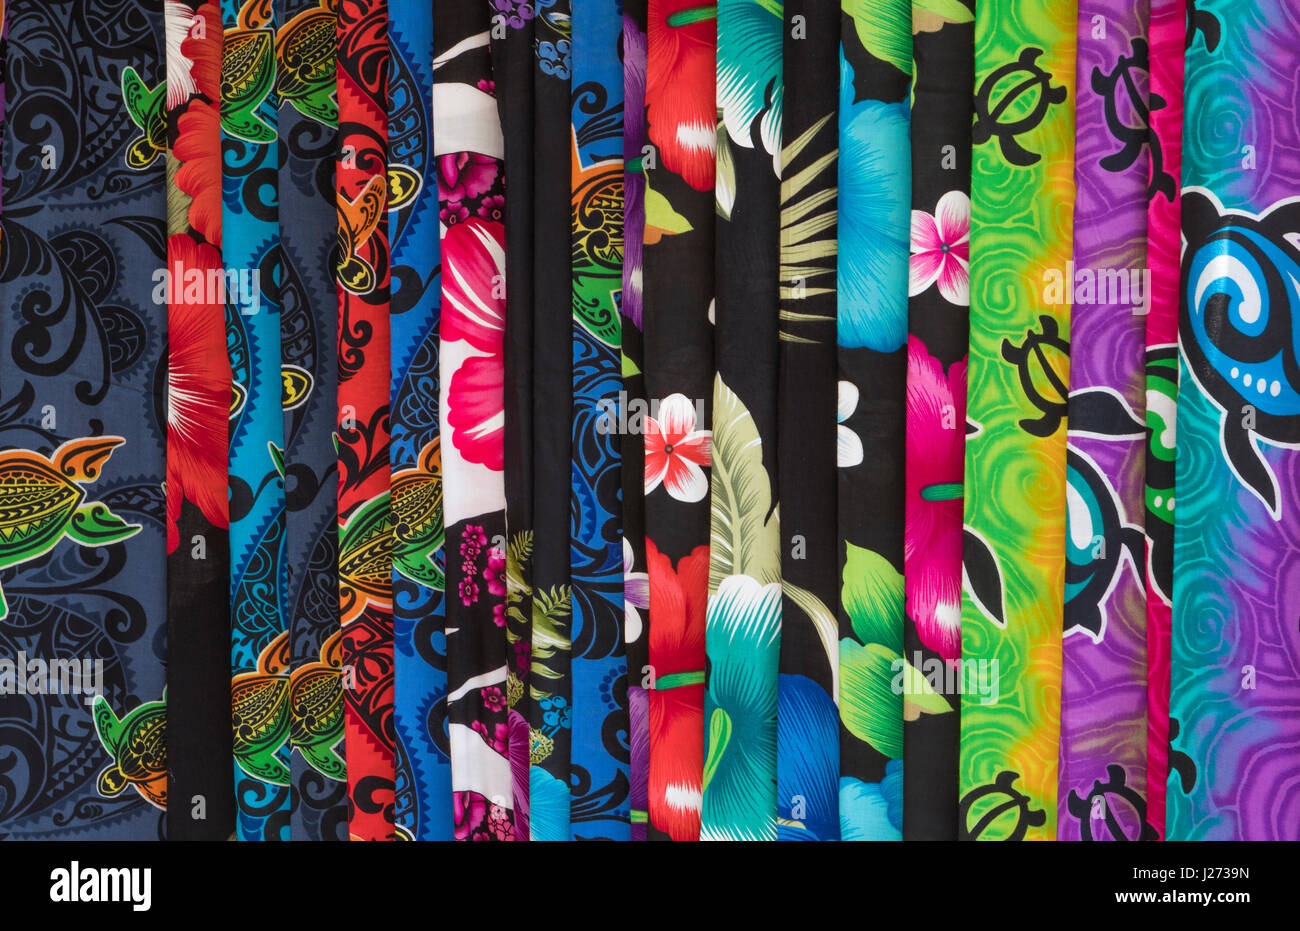 Kapaa Kauai Hawaii il mercato delle pulci con Hawaiian tessuti clorful sarong per la vendita Foto Stock